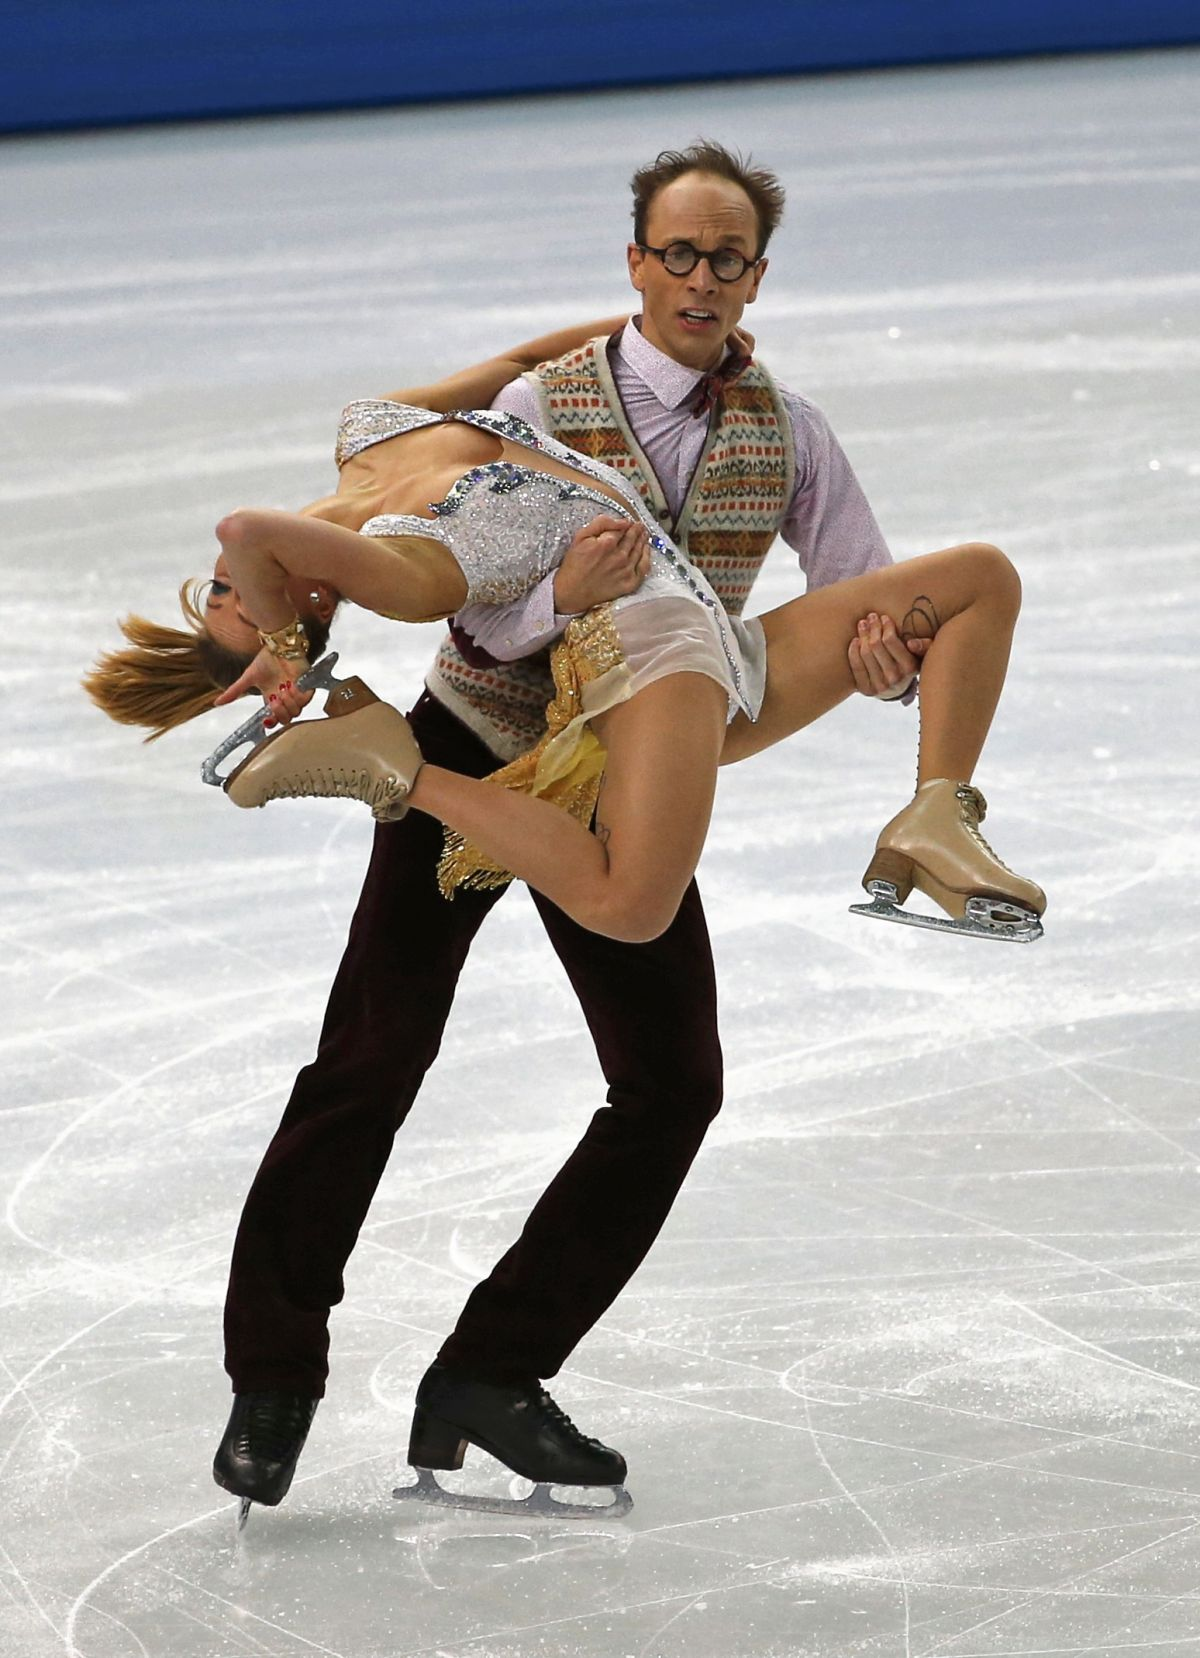 NELLI ZHIGANSHINA and Alexander Gazsi at 2014 Winter Olympics in Sochi